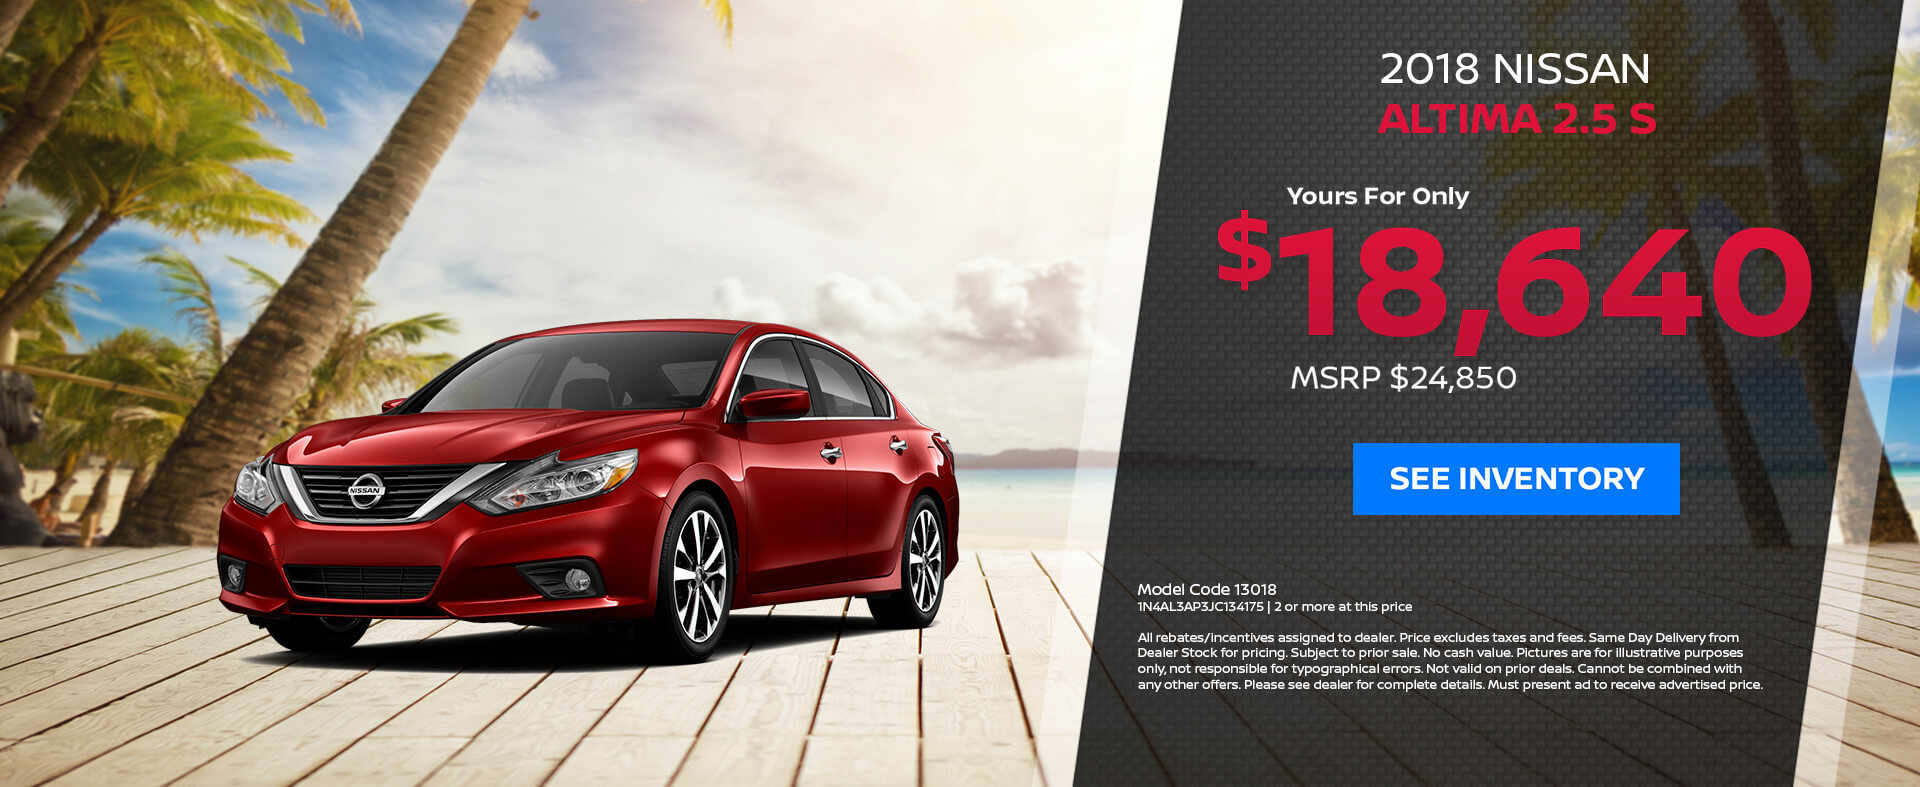 Nissan Altima $18,640 Purchase